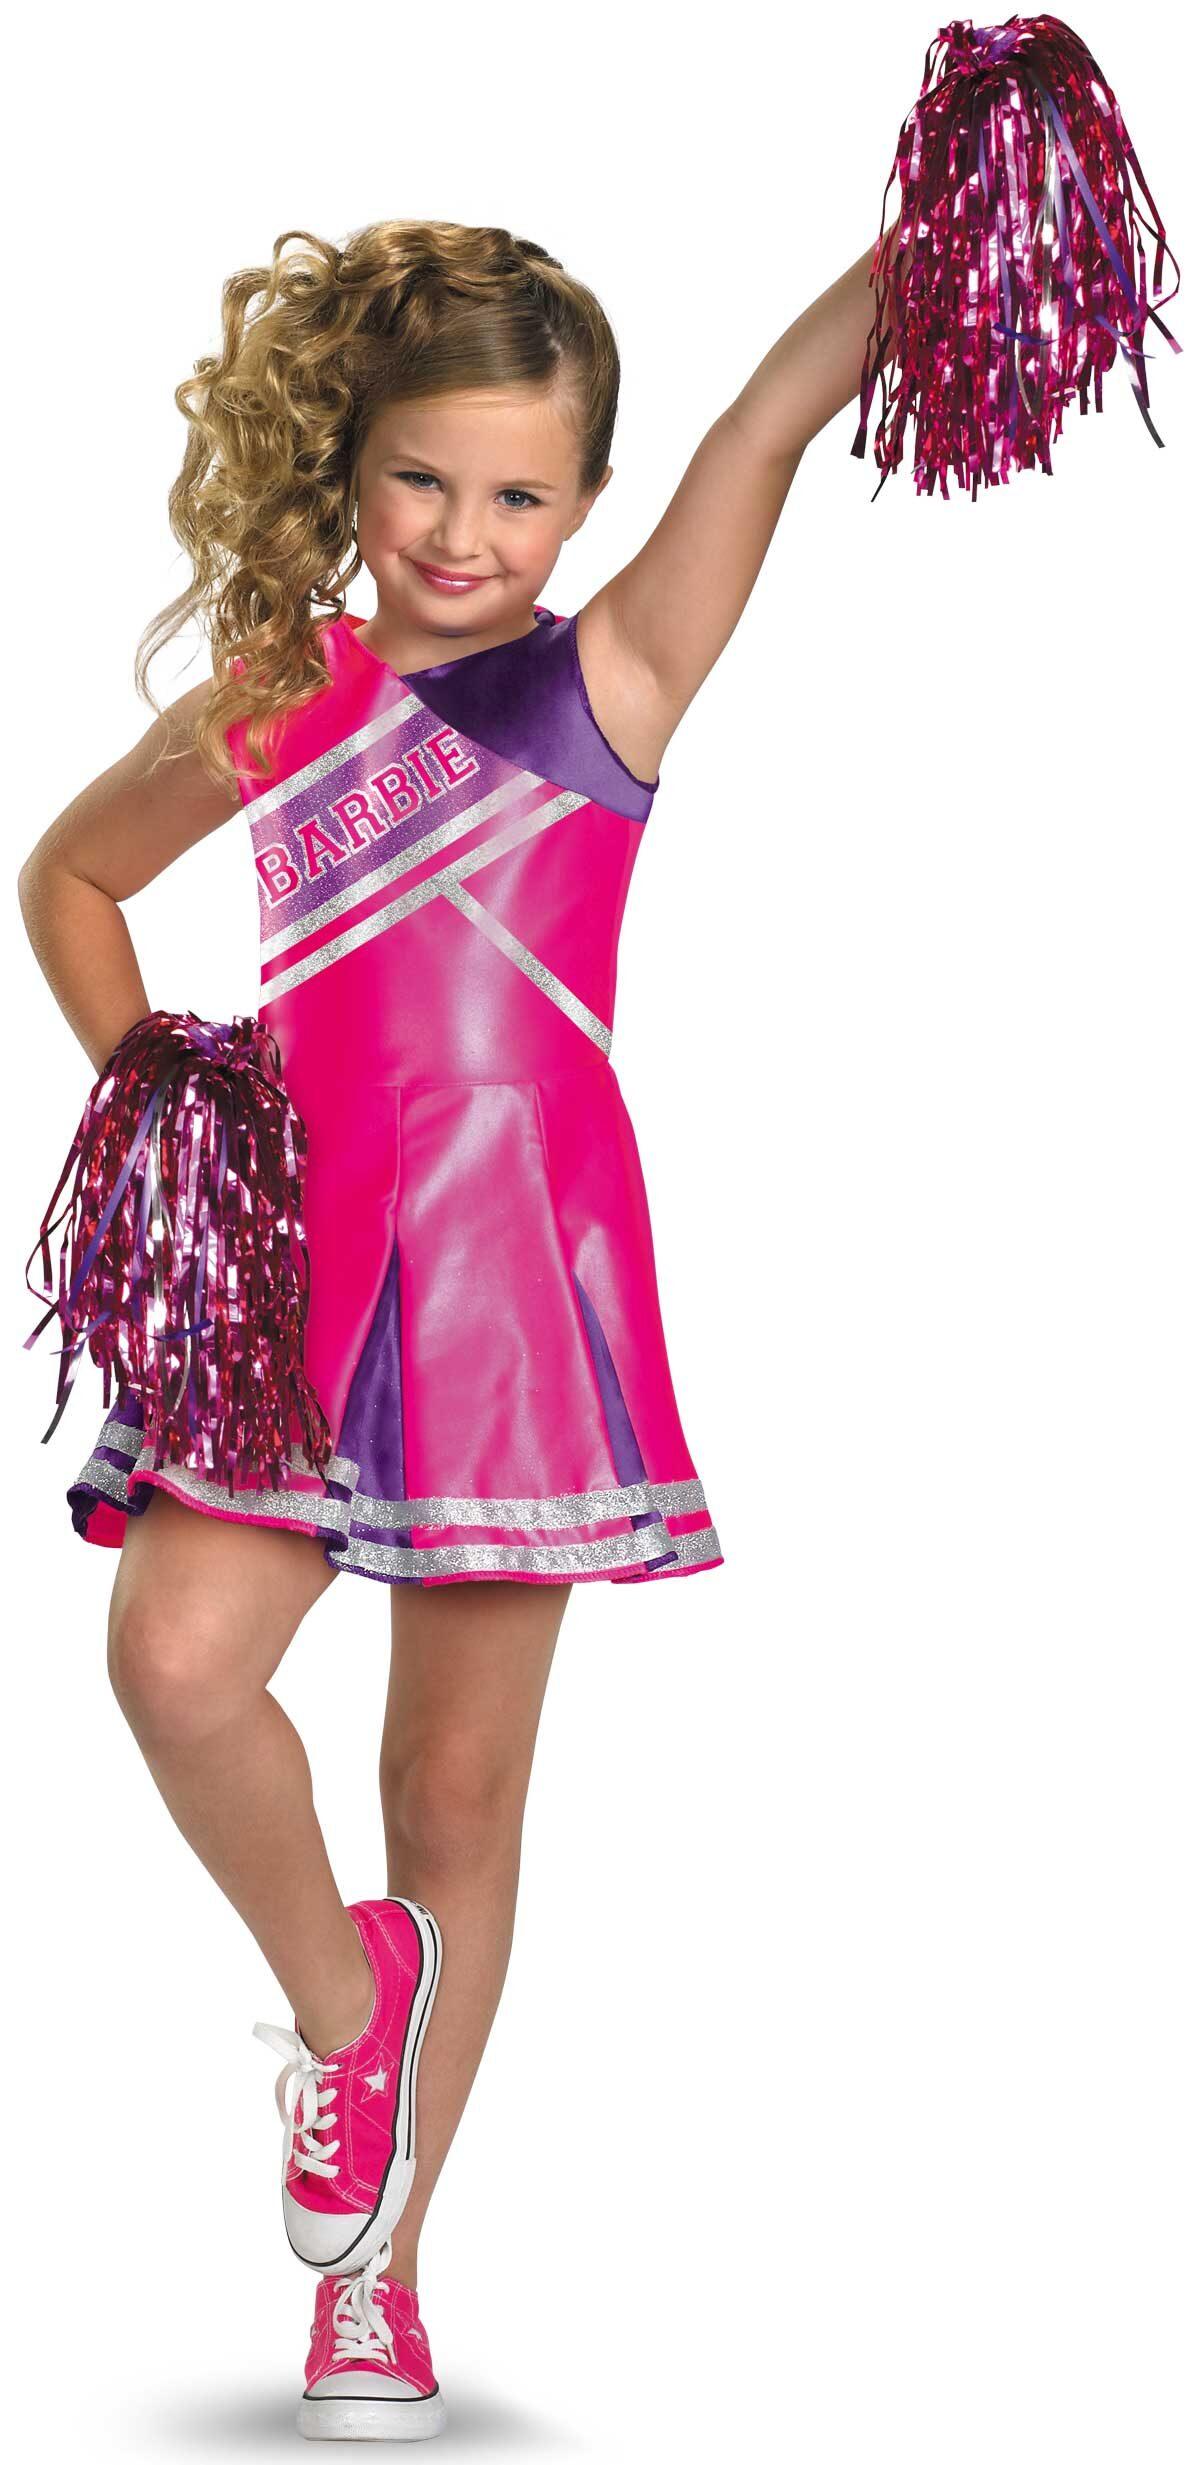 Girls Cheerleader Barb...